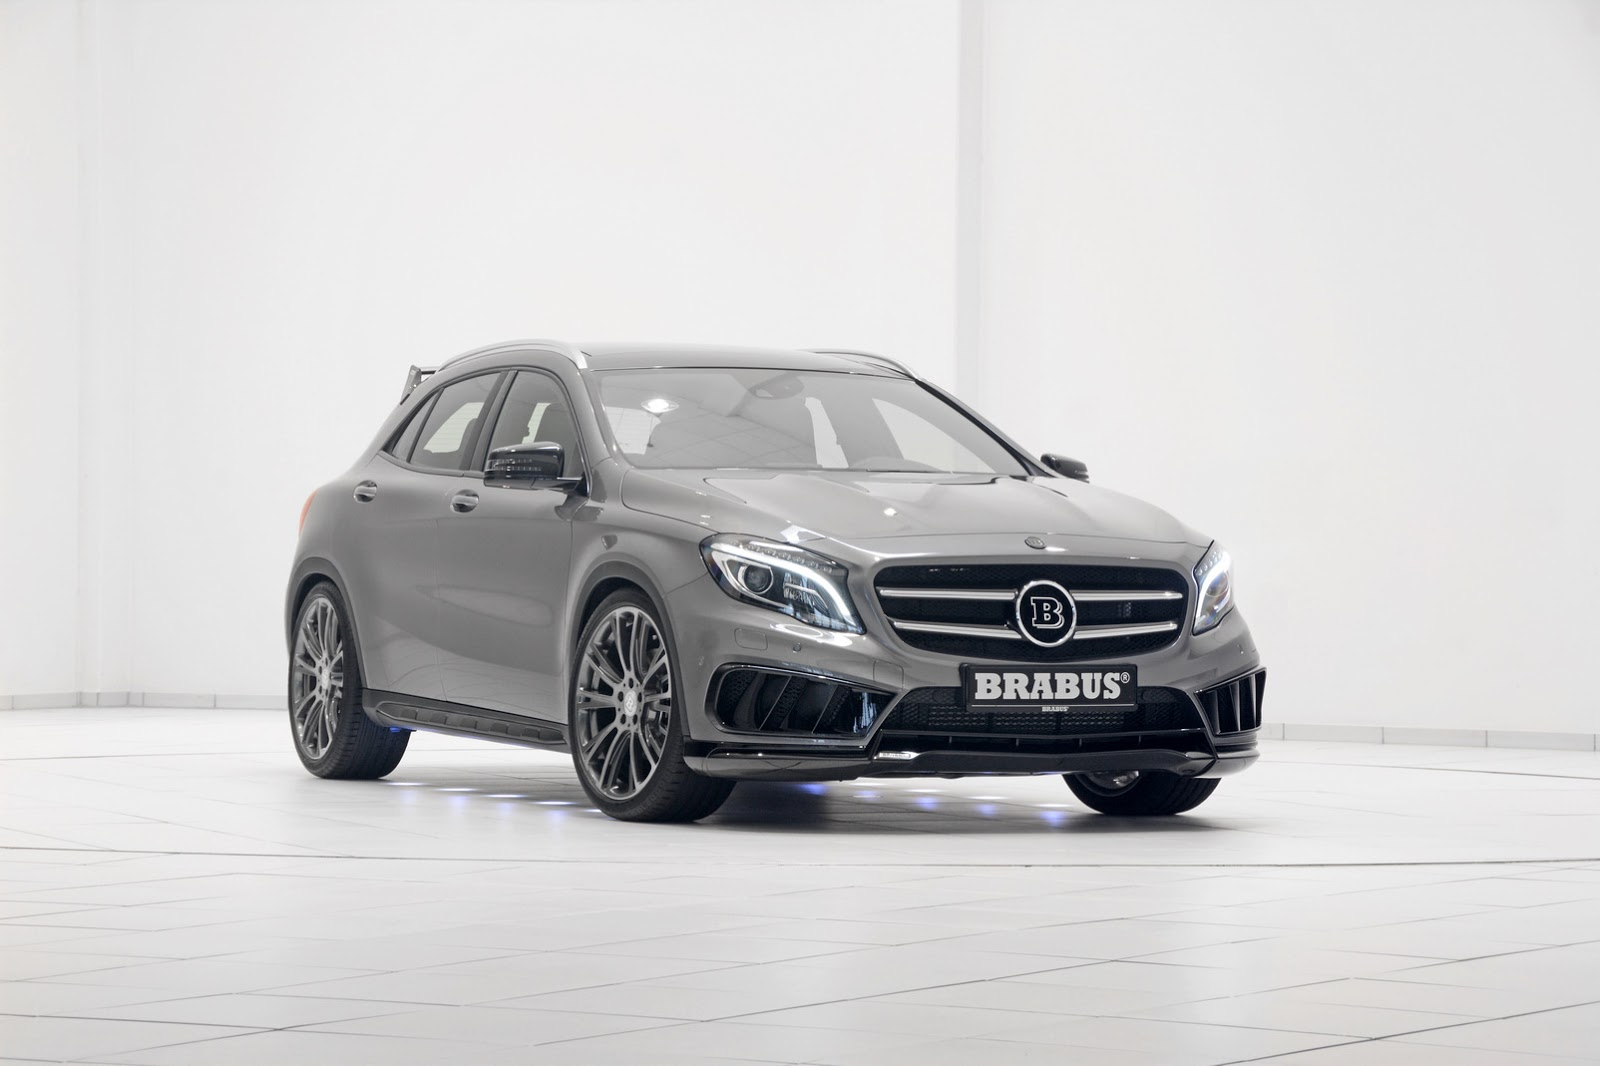 Official 2015 Brabus Mercedes Benz Gla45 Amg Gtspirit